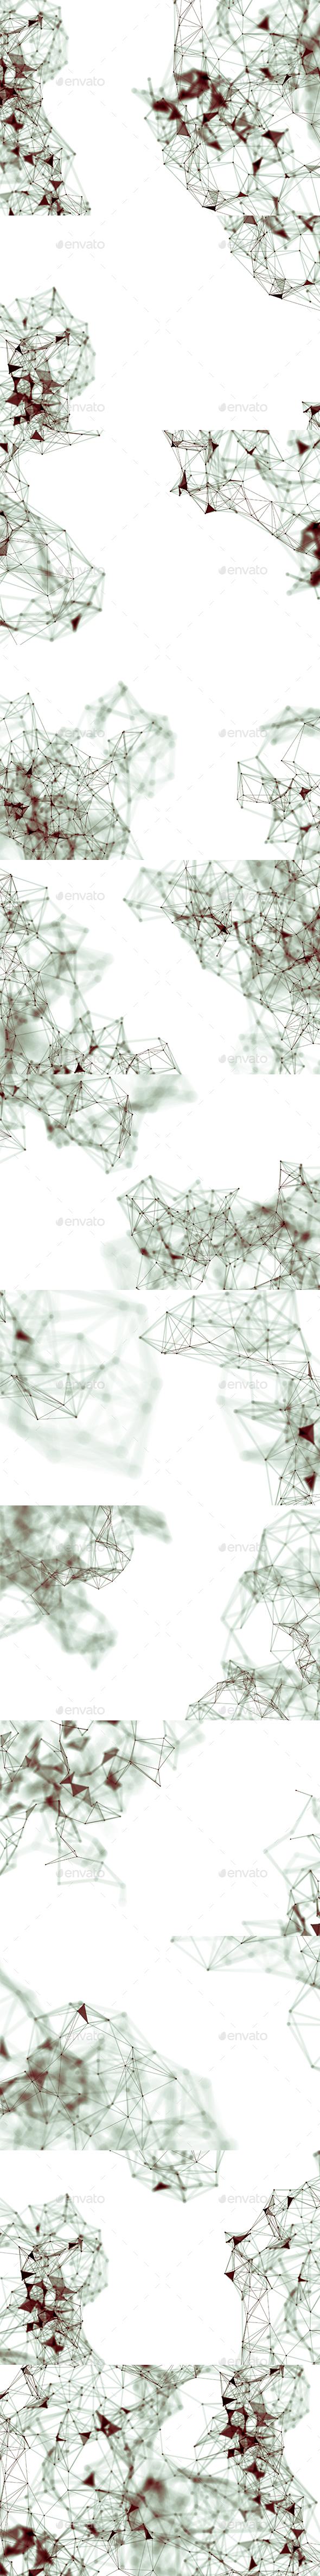 Plexus Backgrounds Vol20 - Abstract Backgrounds